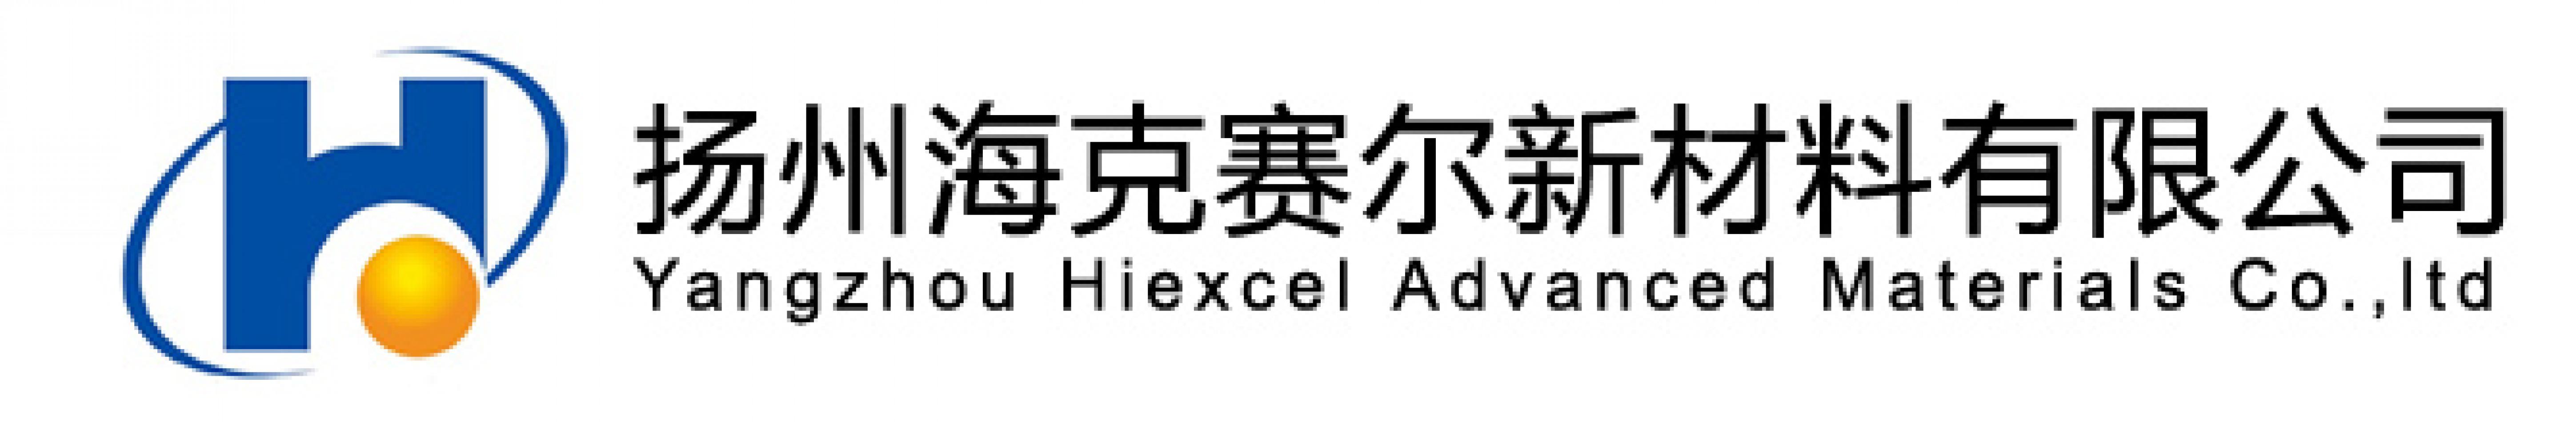 YANGZHOU HIEXCEL ADVANCED MATERIALS CO., LTD.